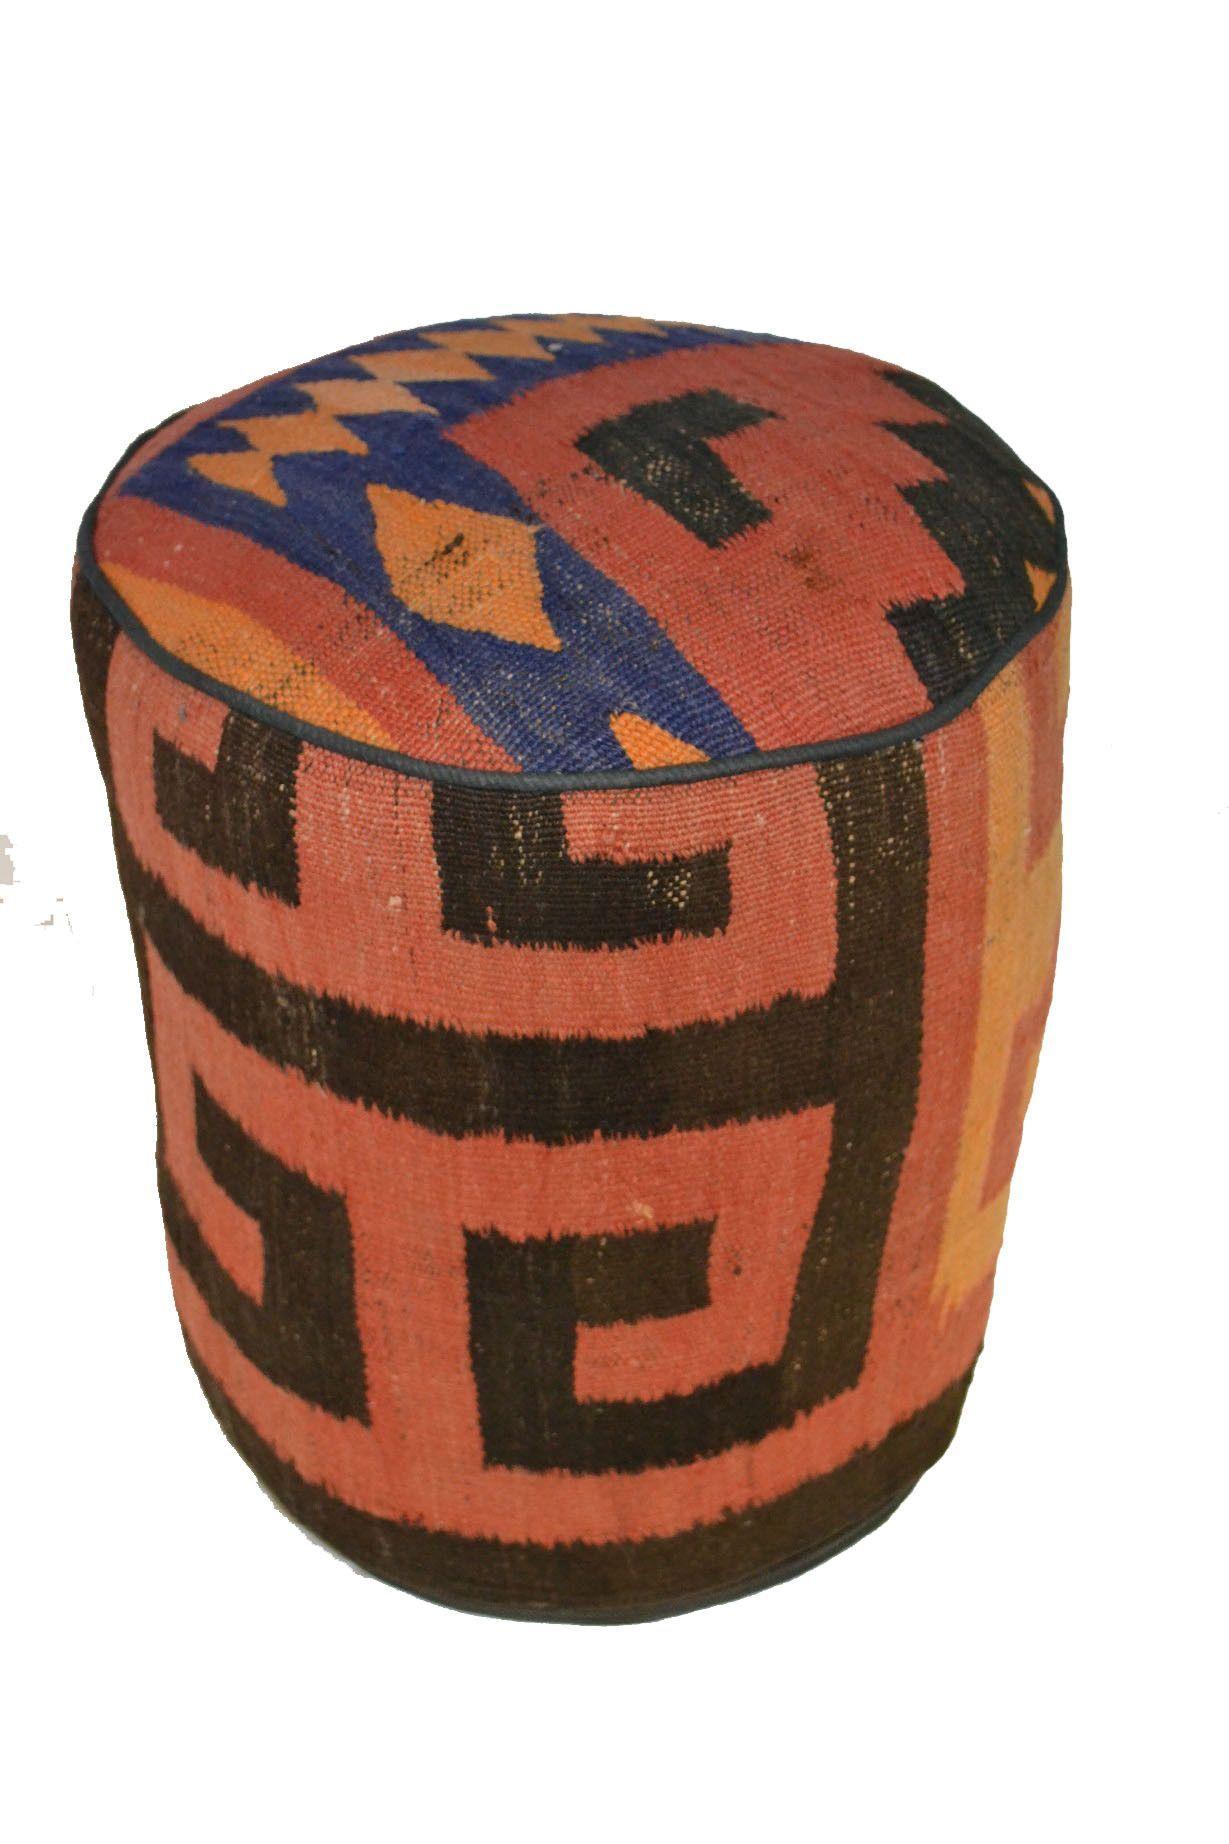 Rug Pouf / Rug Sitting Stool / Rug Ottoman / Kilim Sitting Stool / Stools # 45